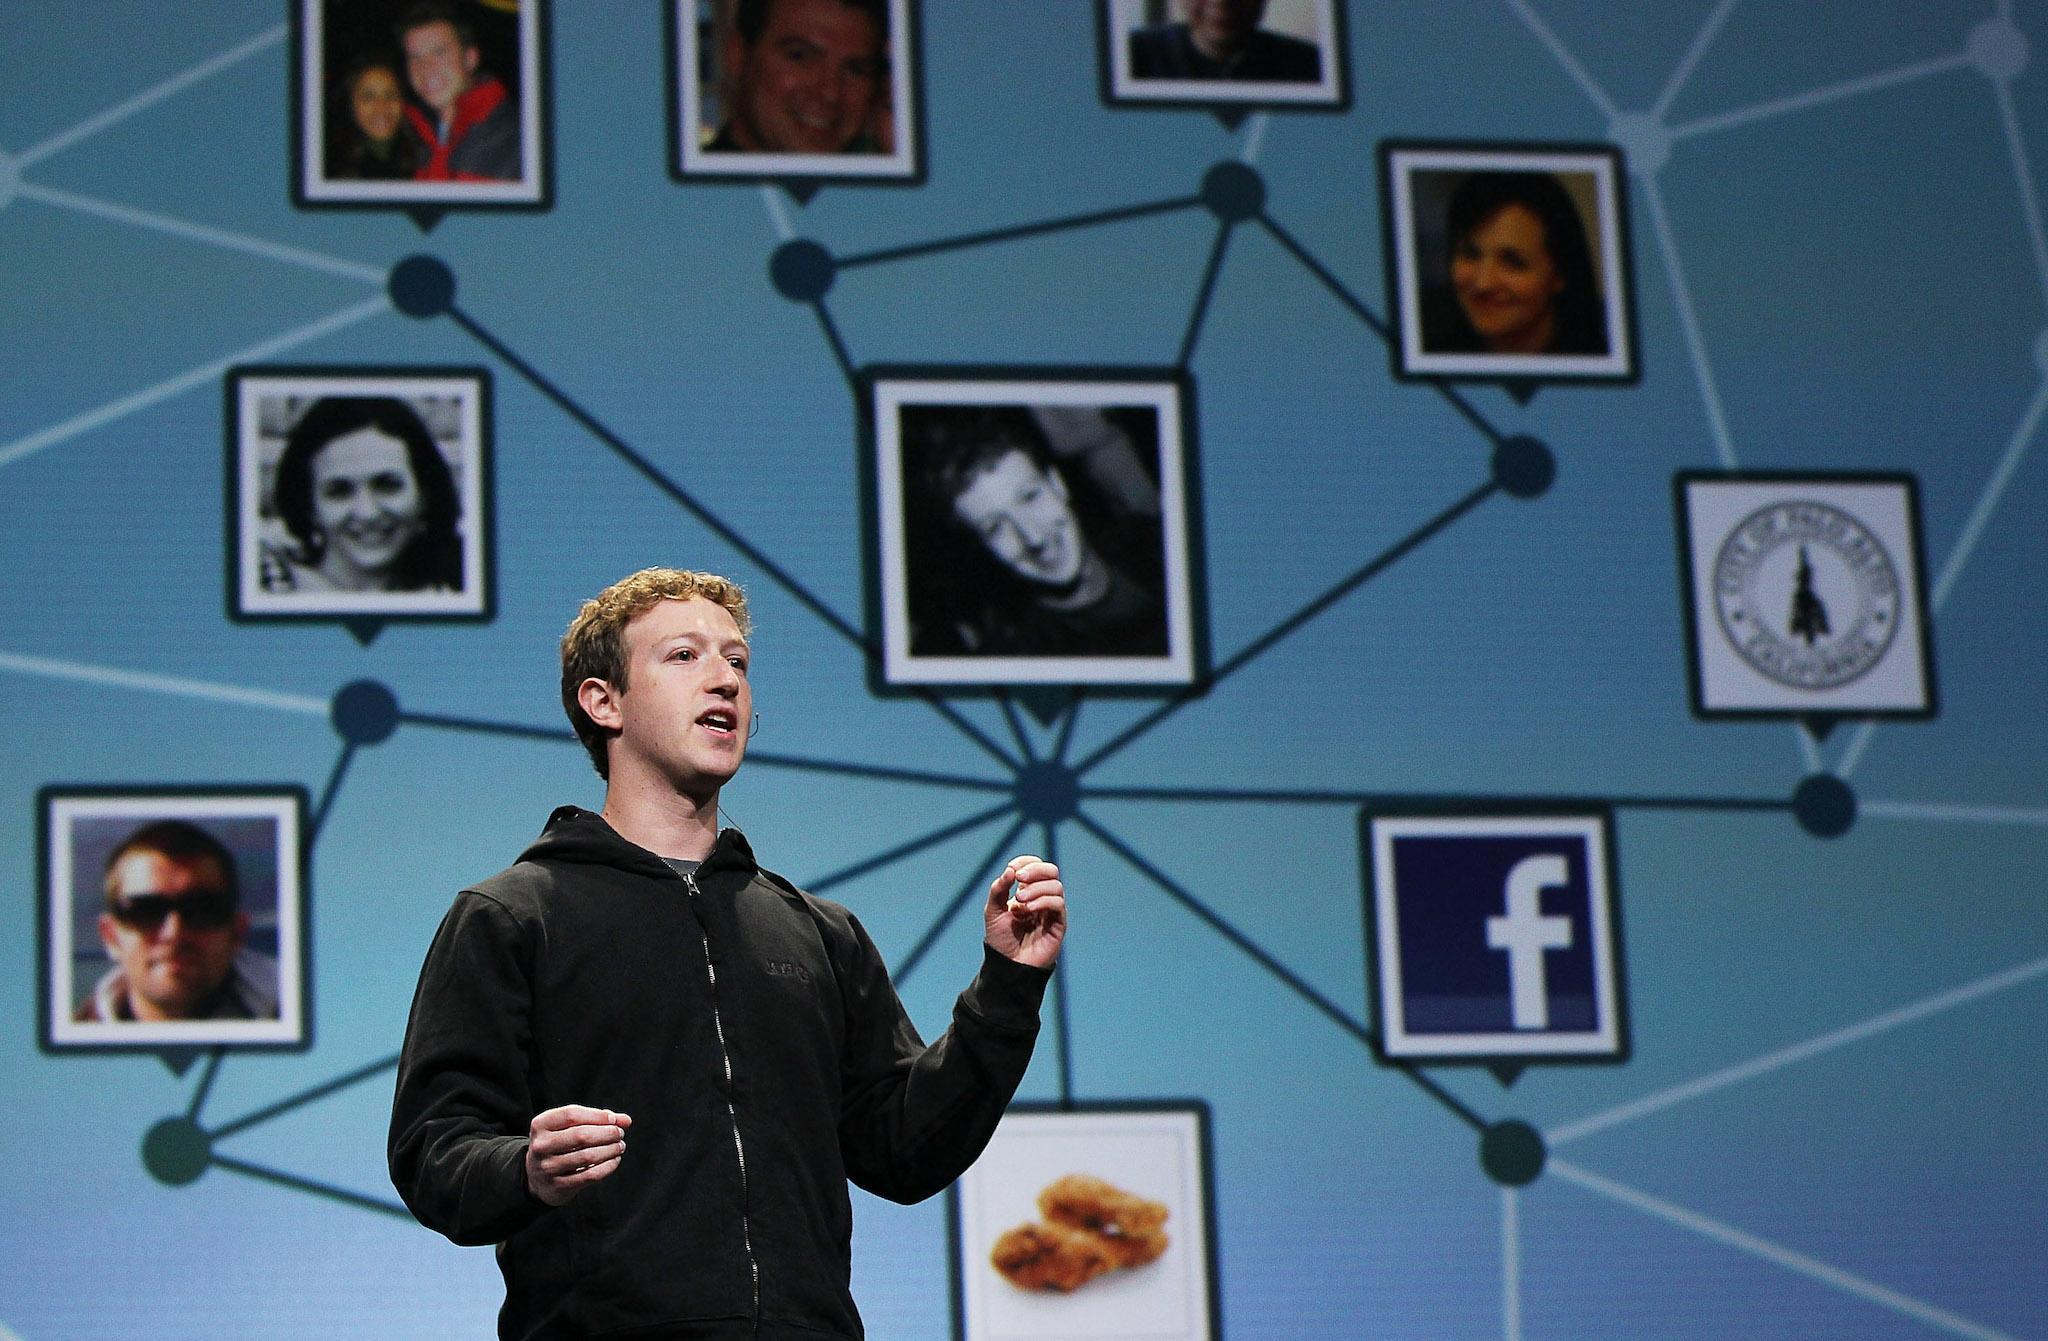 Mark Zuckerberg says he might add bitcoin to Facebook